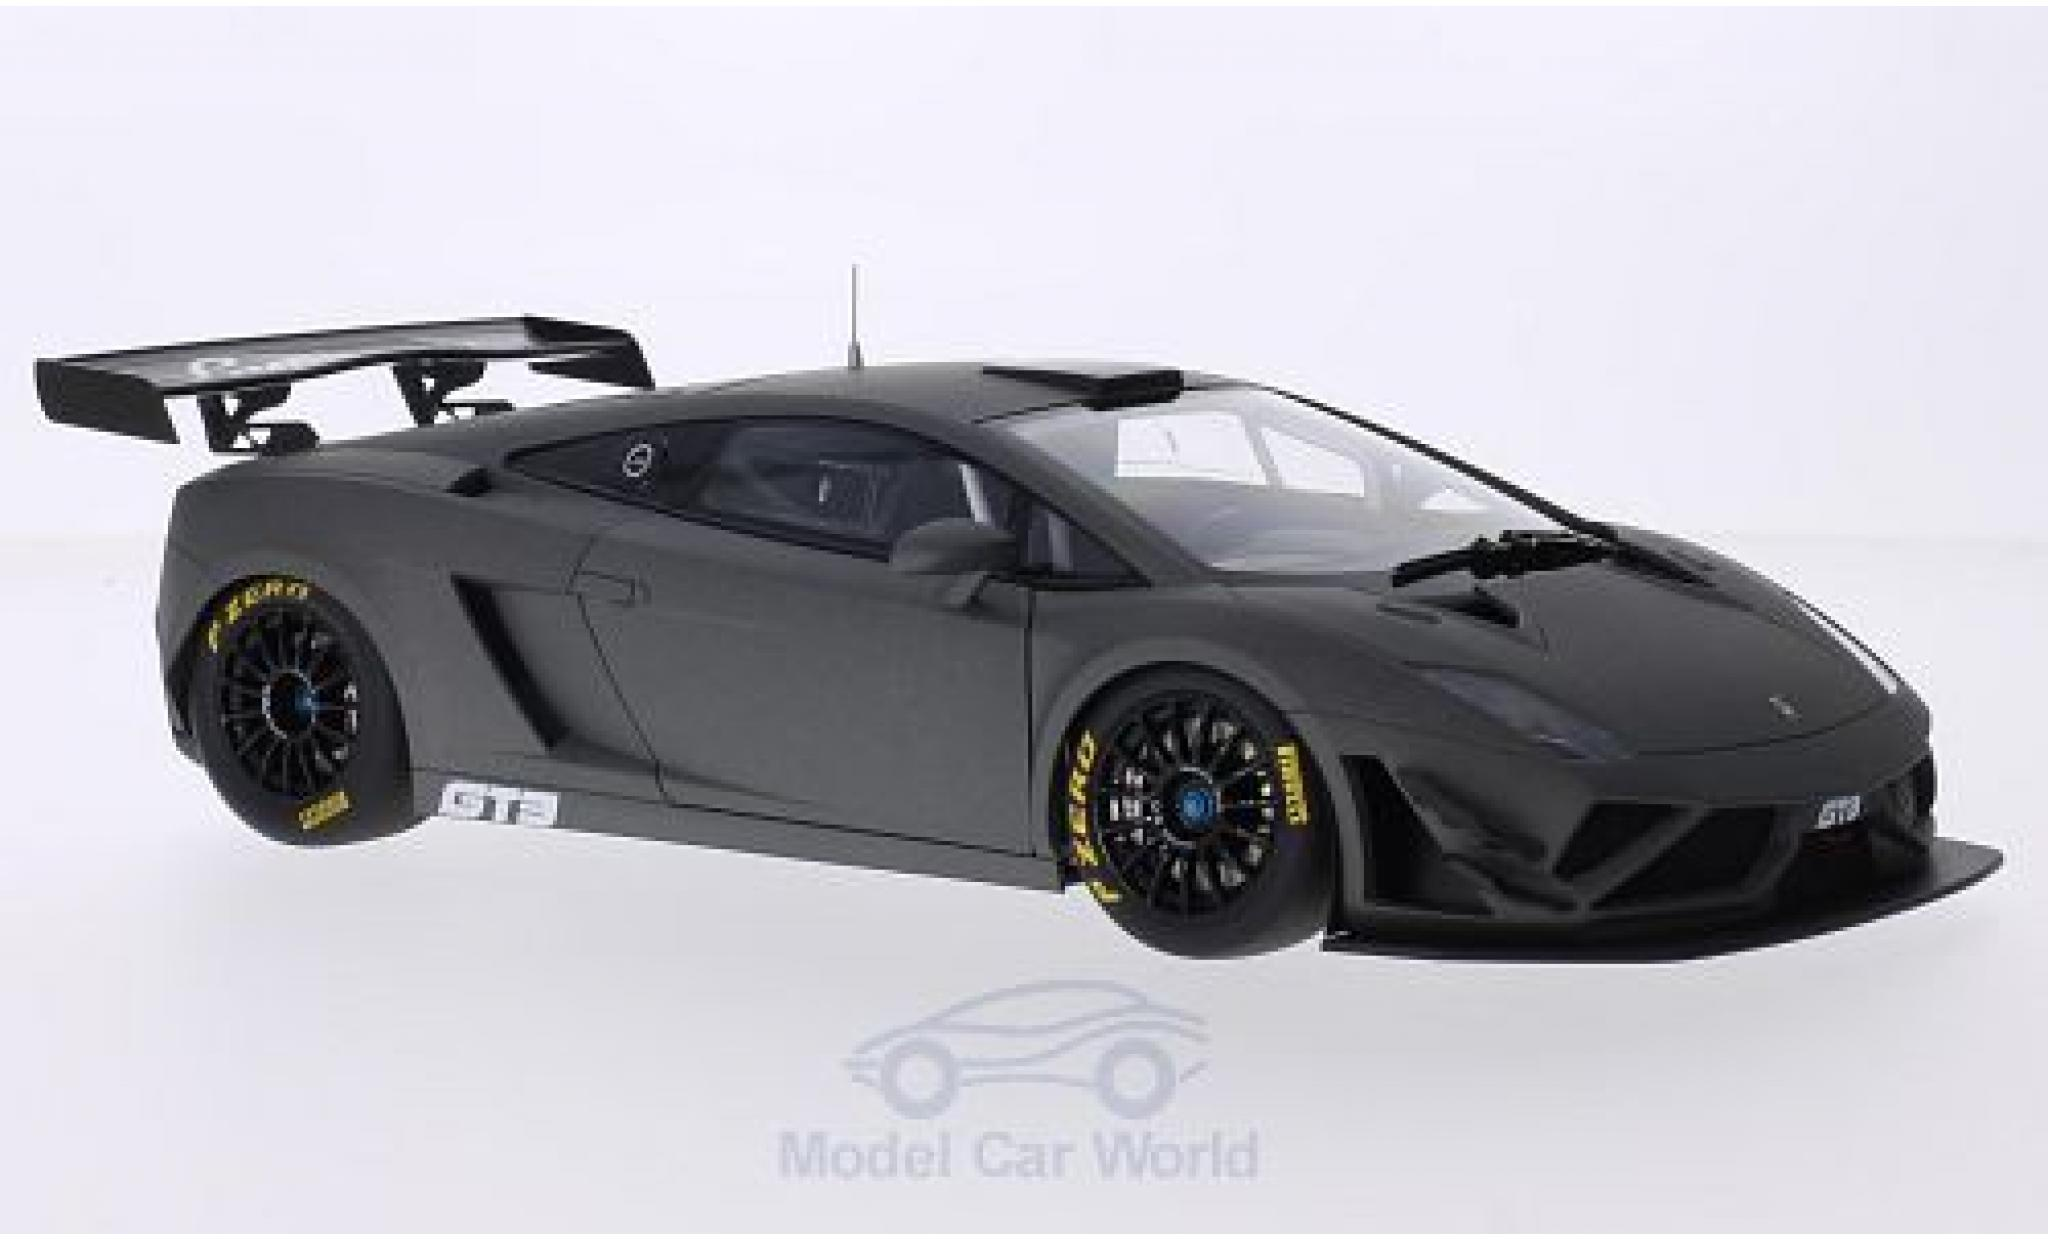 Lamborghini Gallardo 1/18 AUTOart GT3 FL2 matt-grey 2013 Plain Body Version